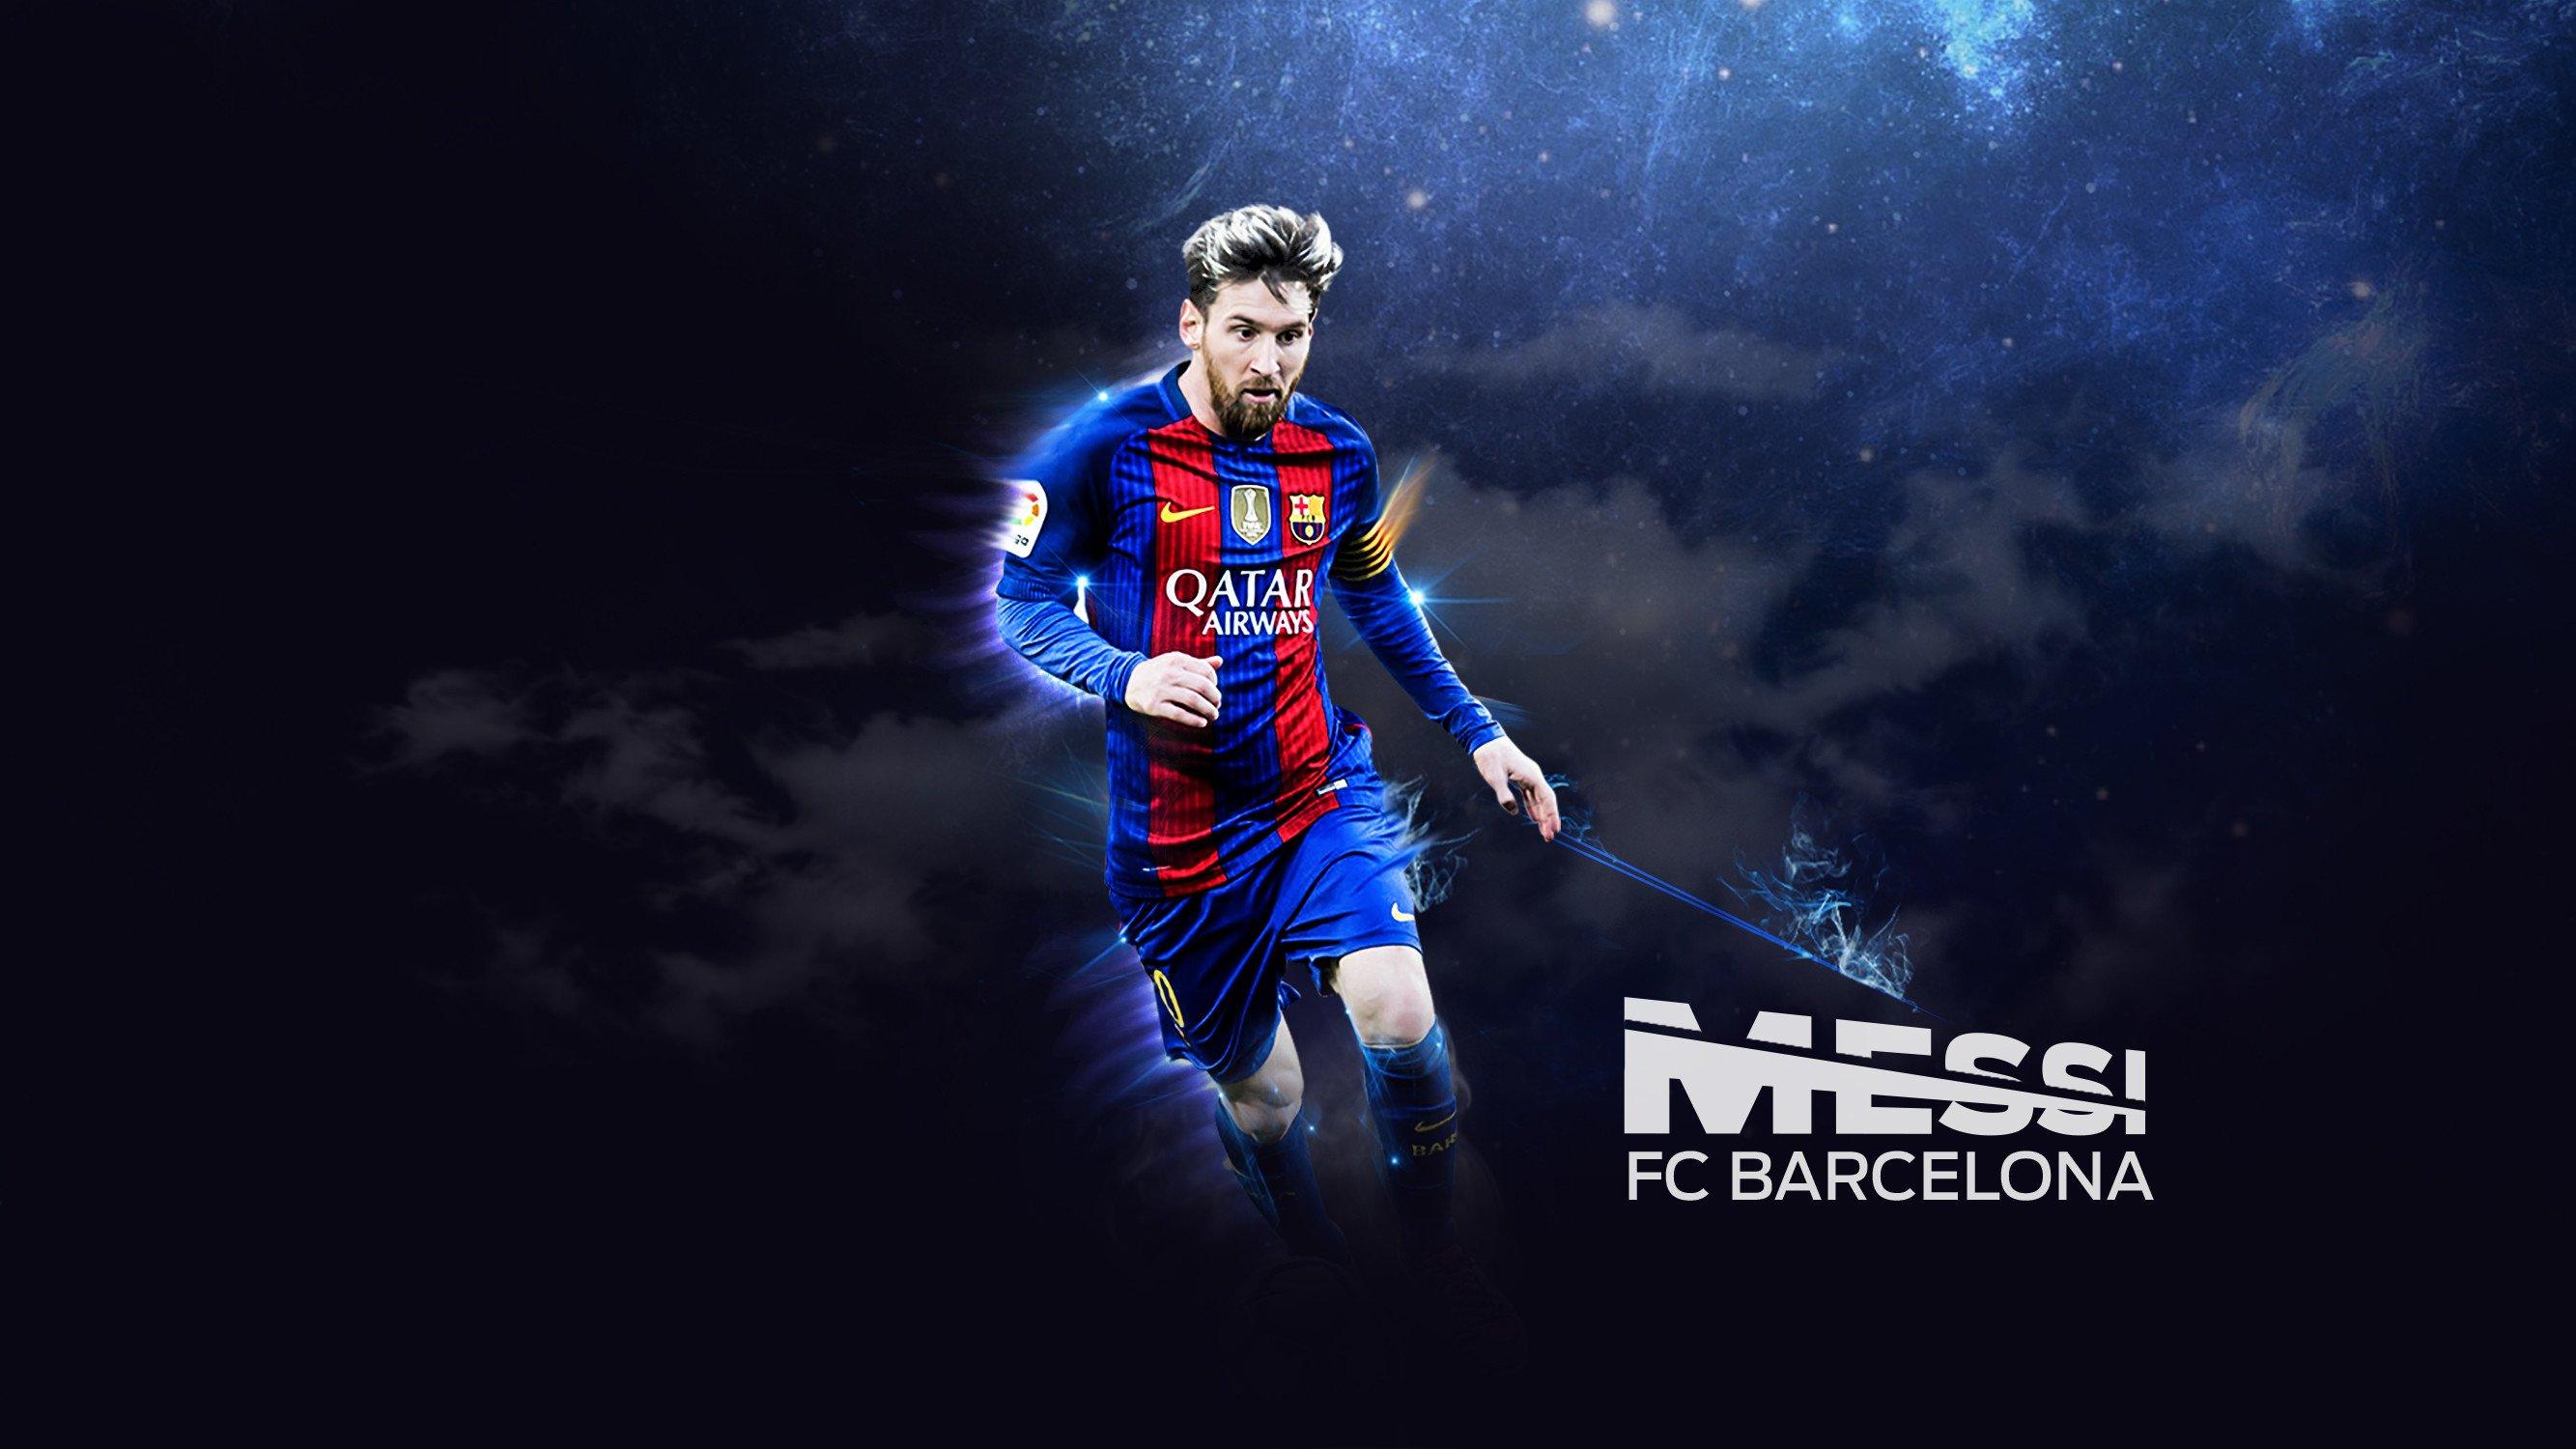 Wallpaper Lionel Messi Barcelona